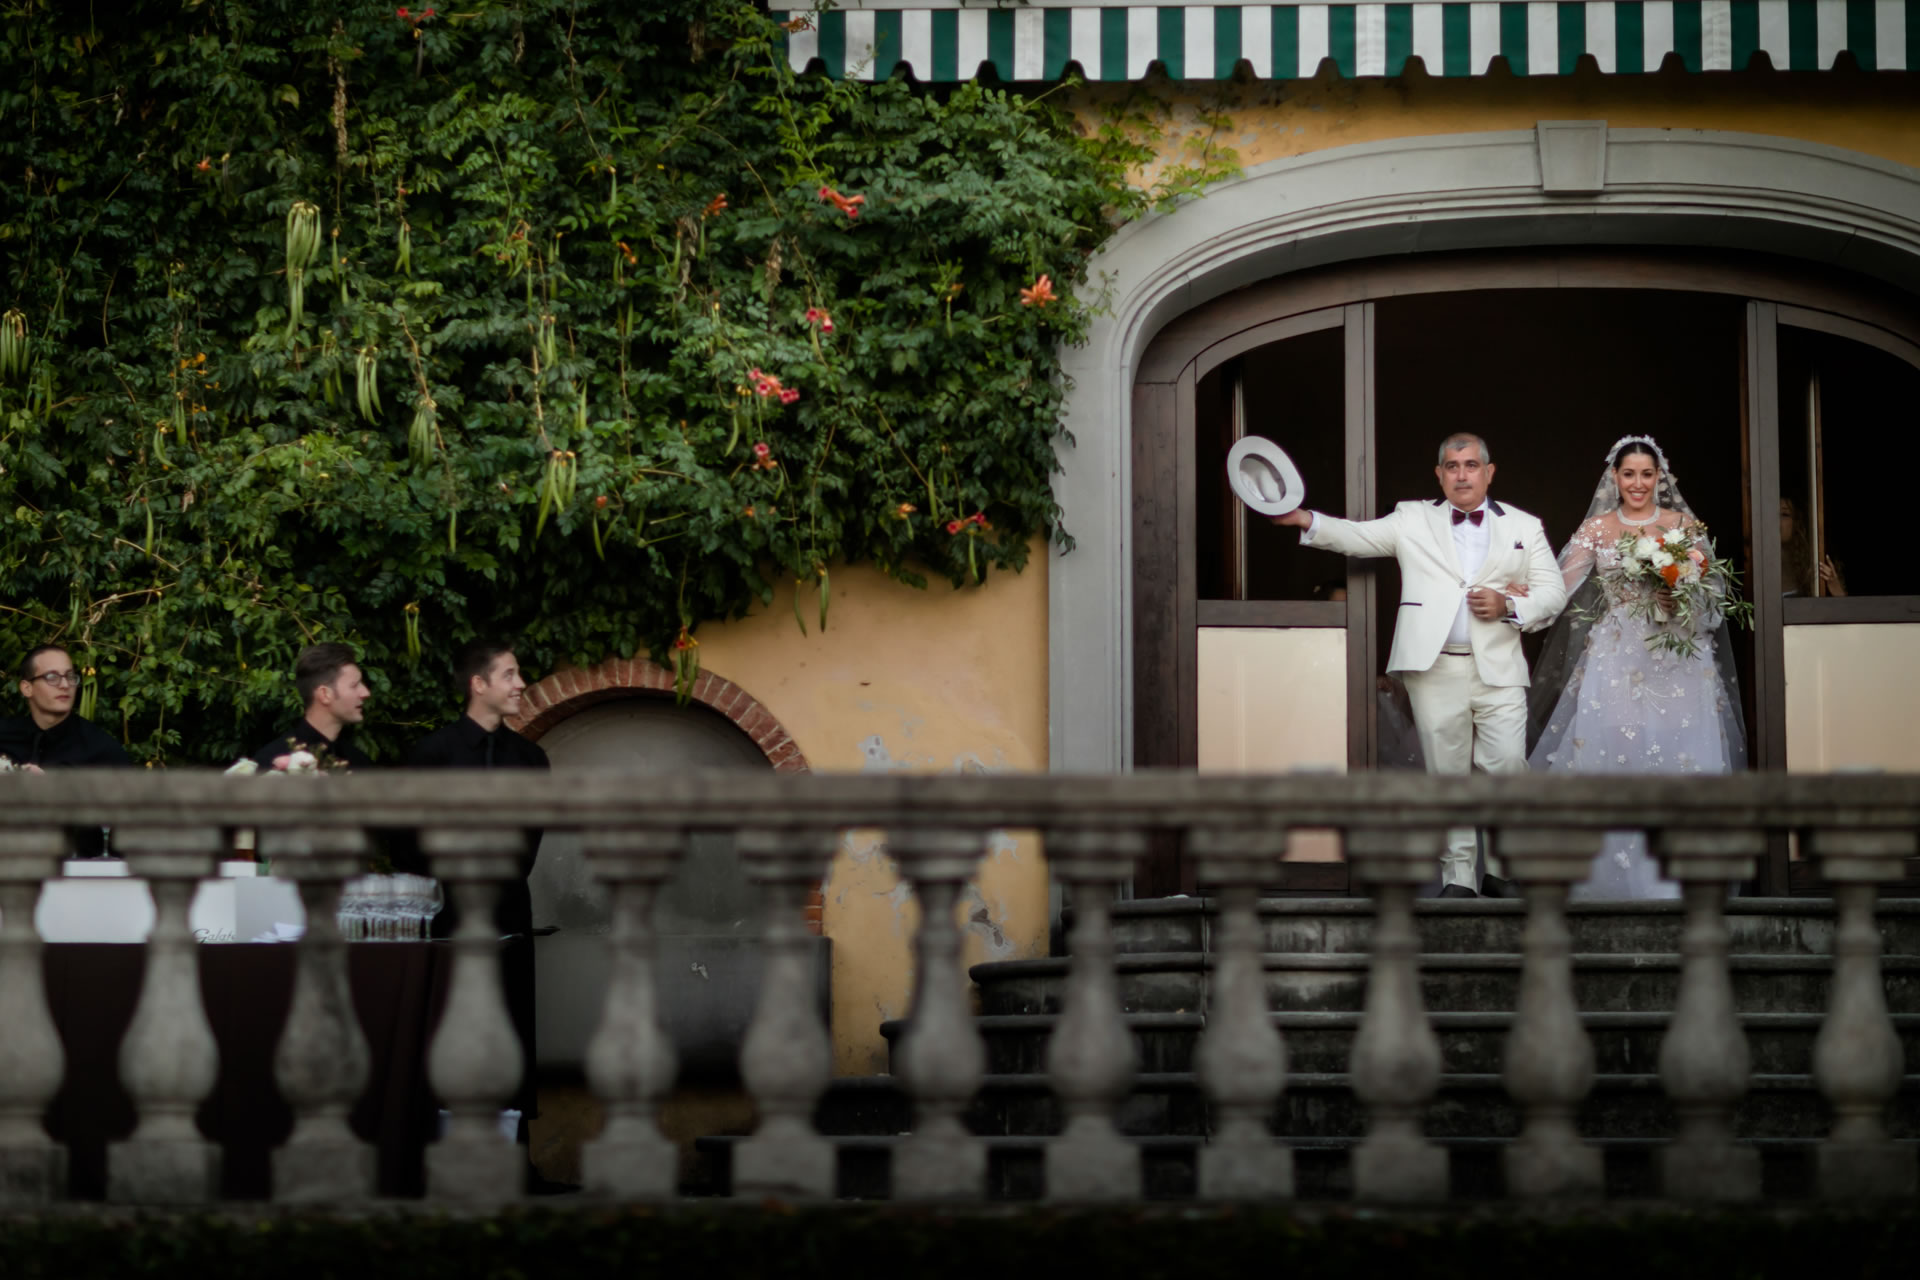 Greeting - 35 :: Luxury wedding at Il Borro :: Luxury wedding photography - 34 :: Greeting - 35